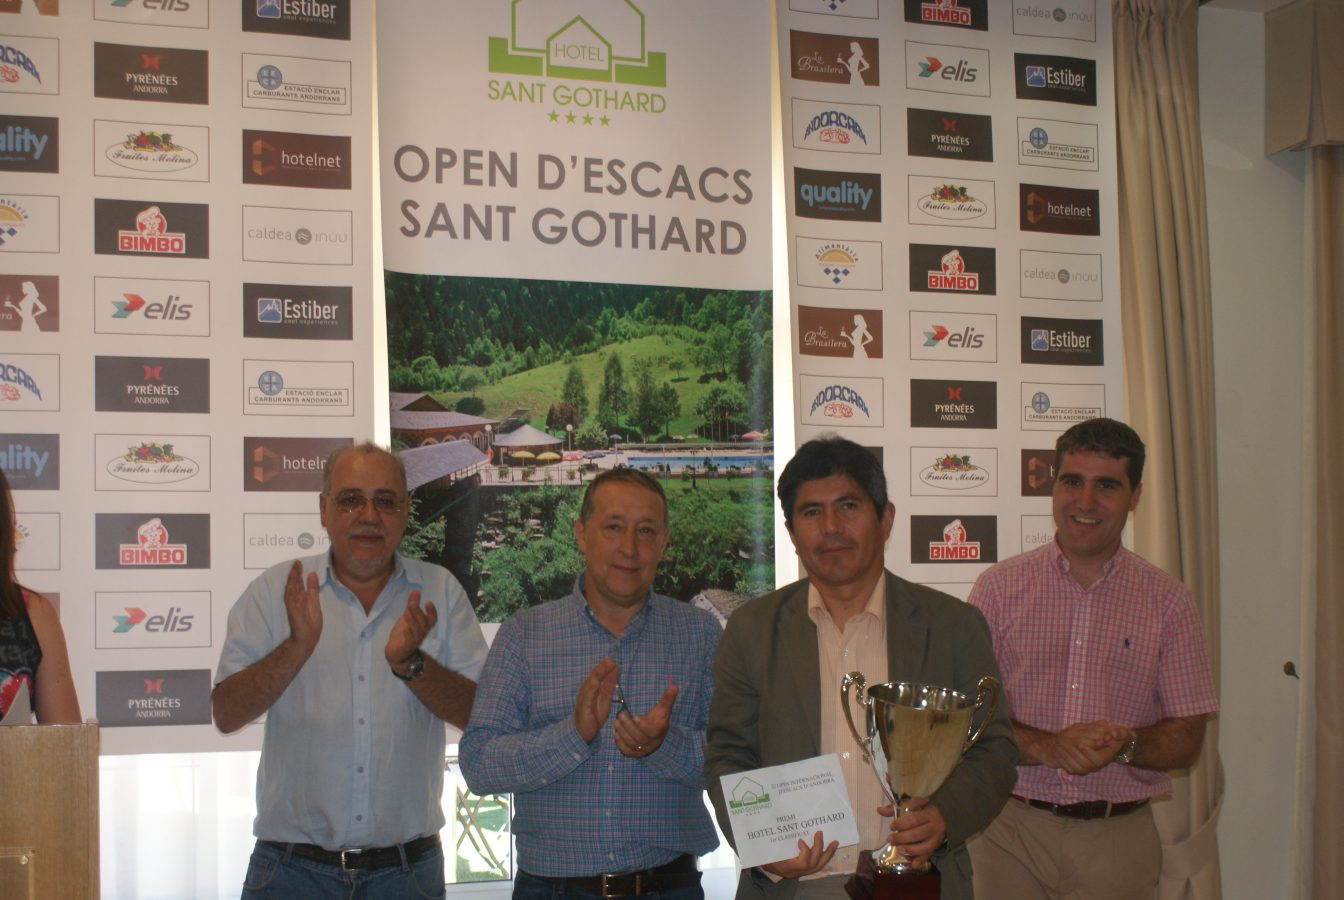 33 Open Andorra Hotel St. Gothard